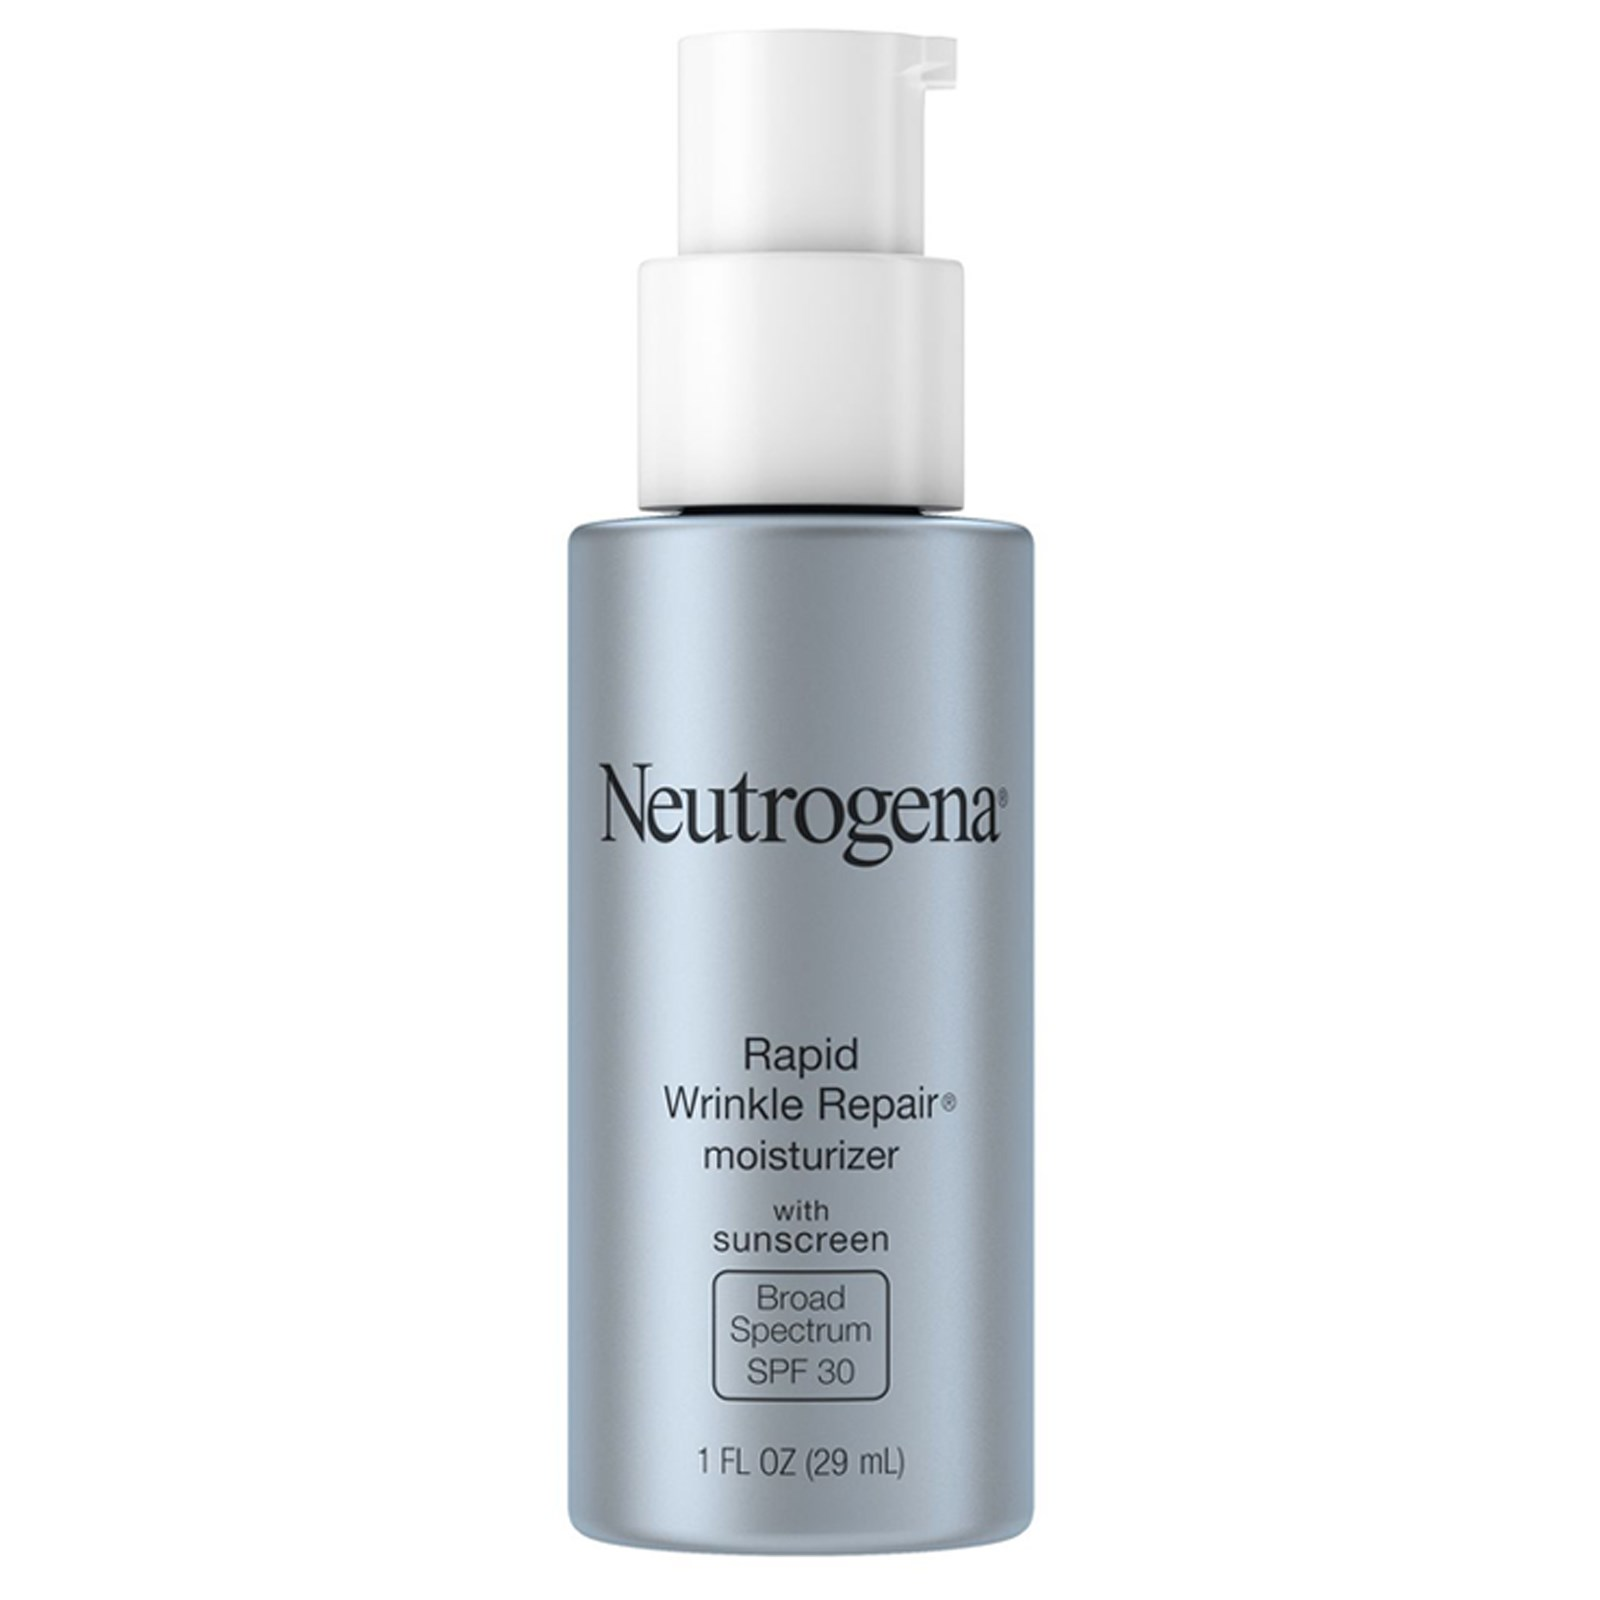 Neutrogena, Rapid Wrinkle Repair Moisturizer SPF 30, 1 fl oz (29 ml)